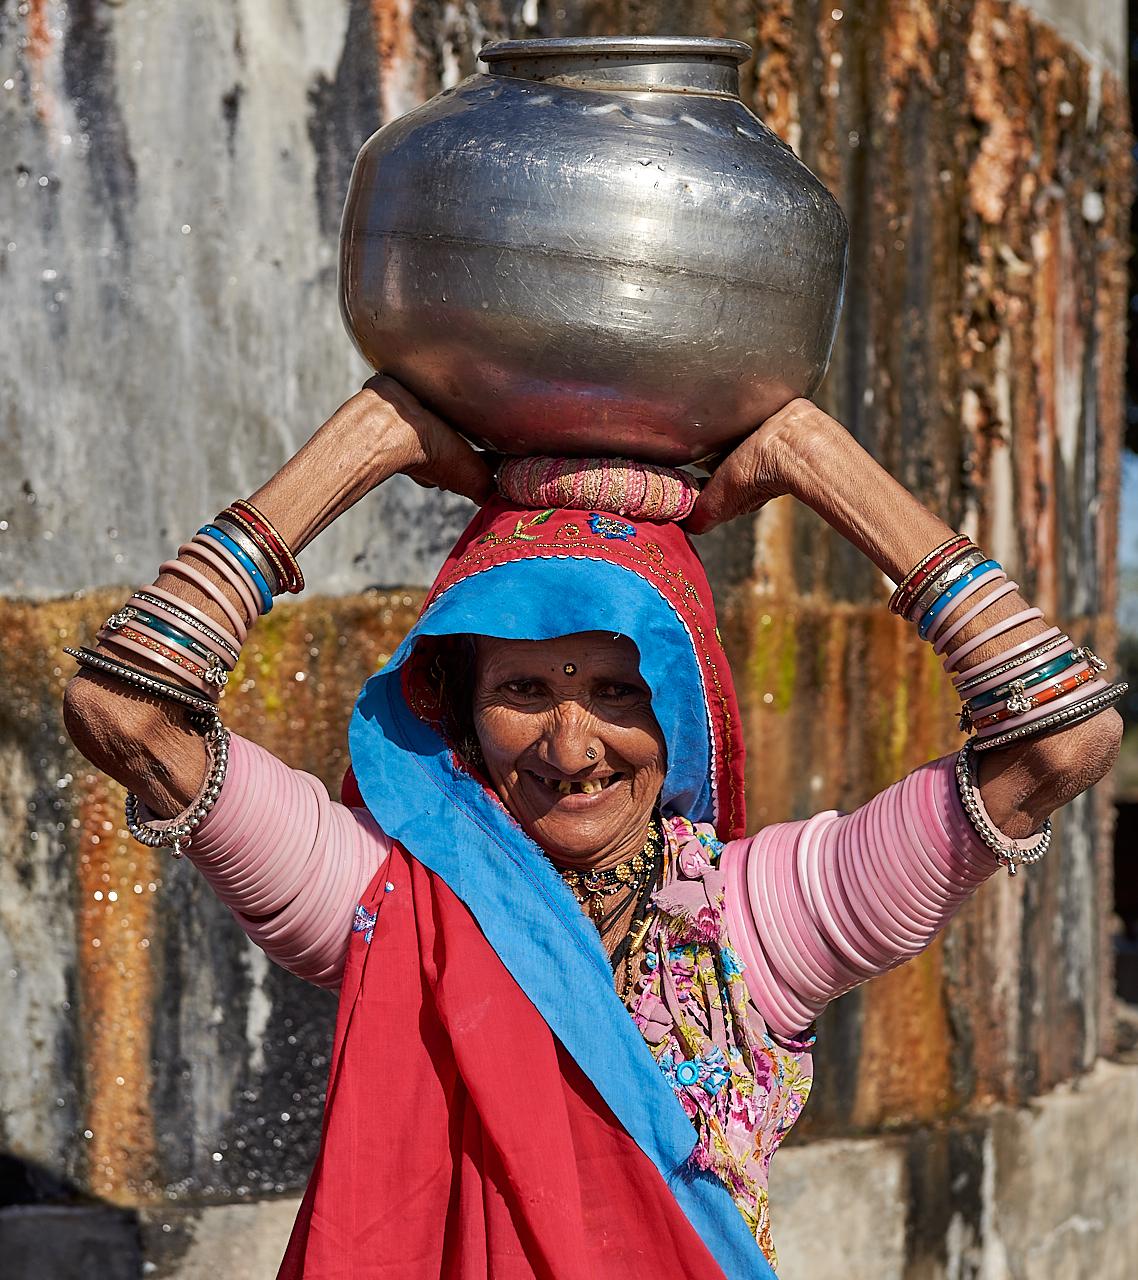 Rabari woman, Rajasthan